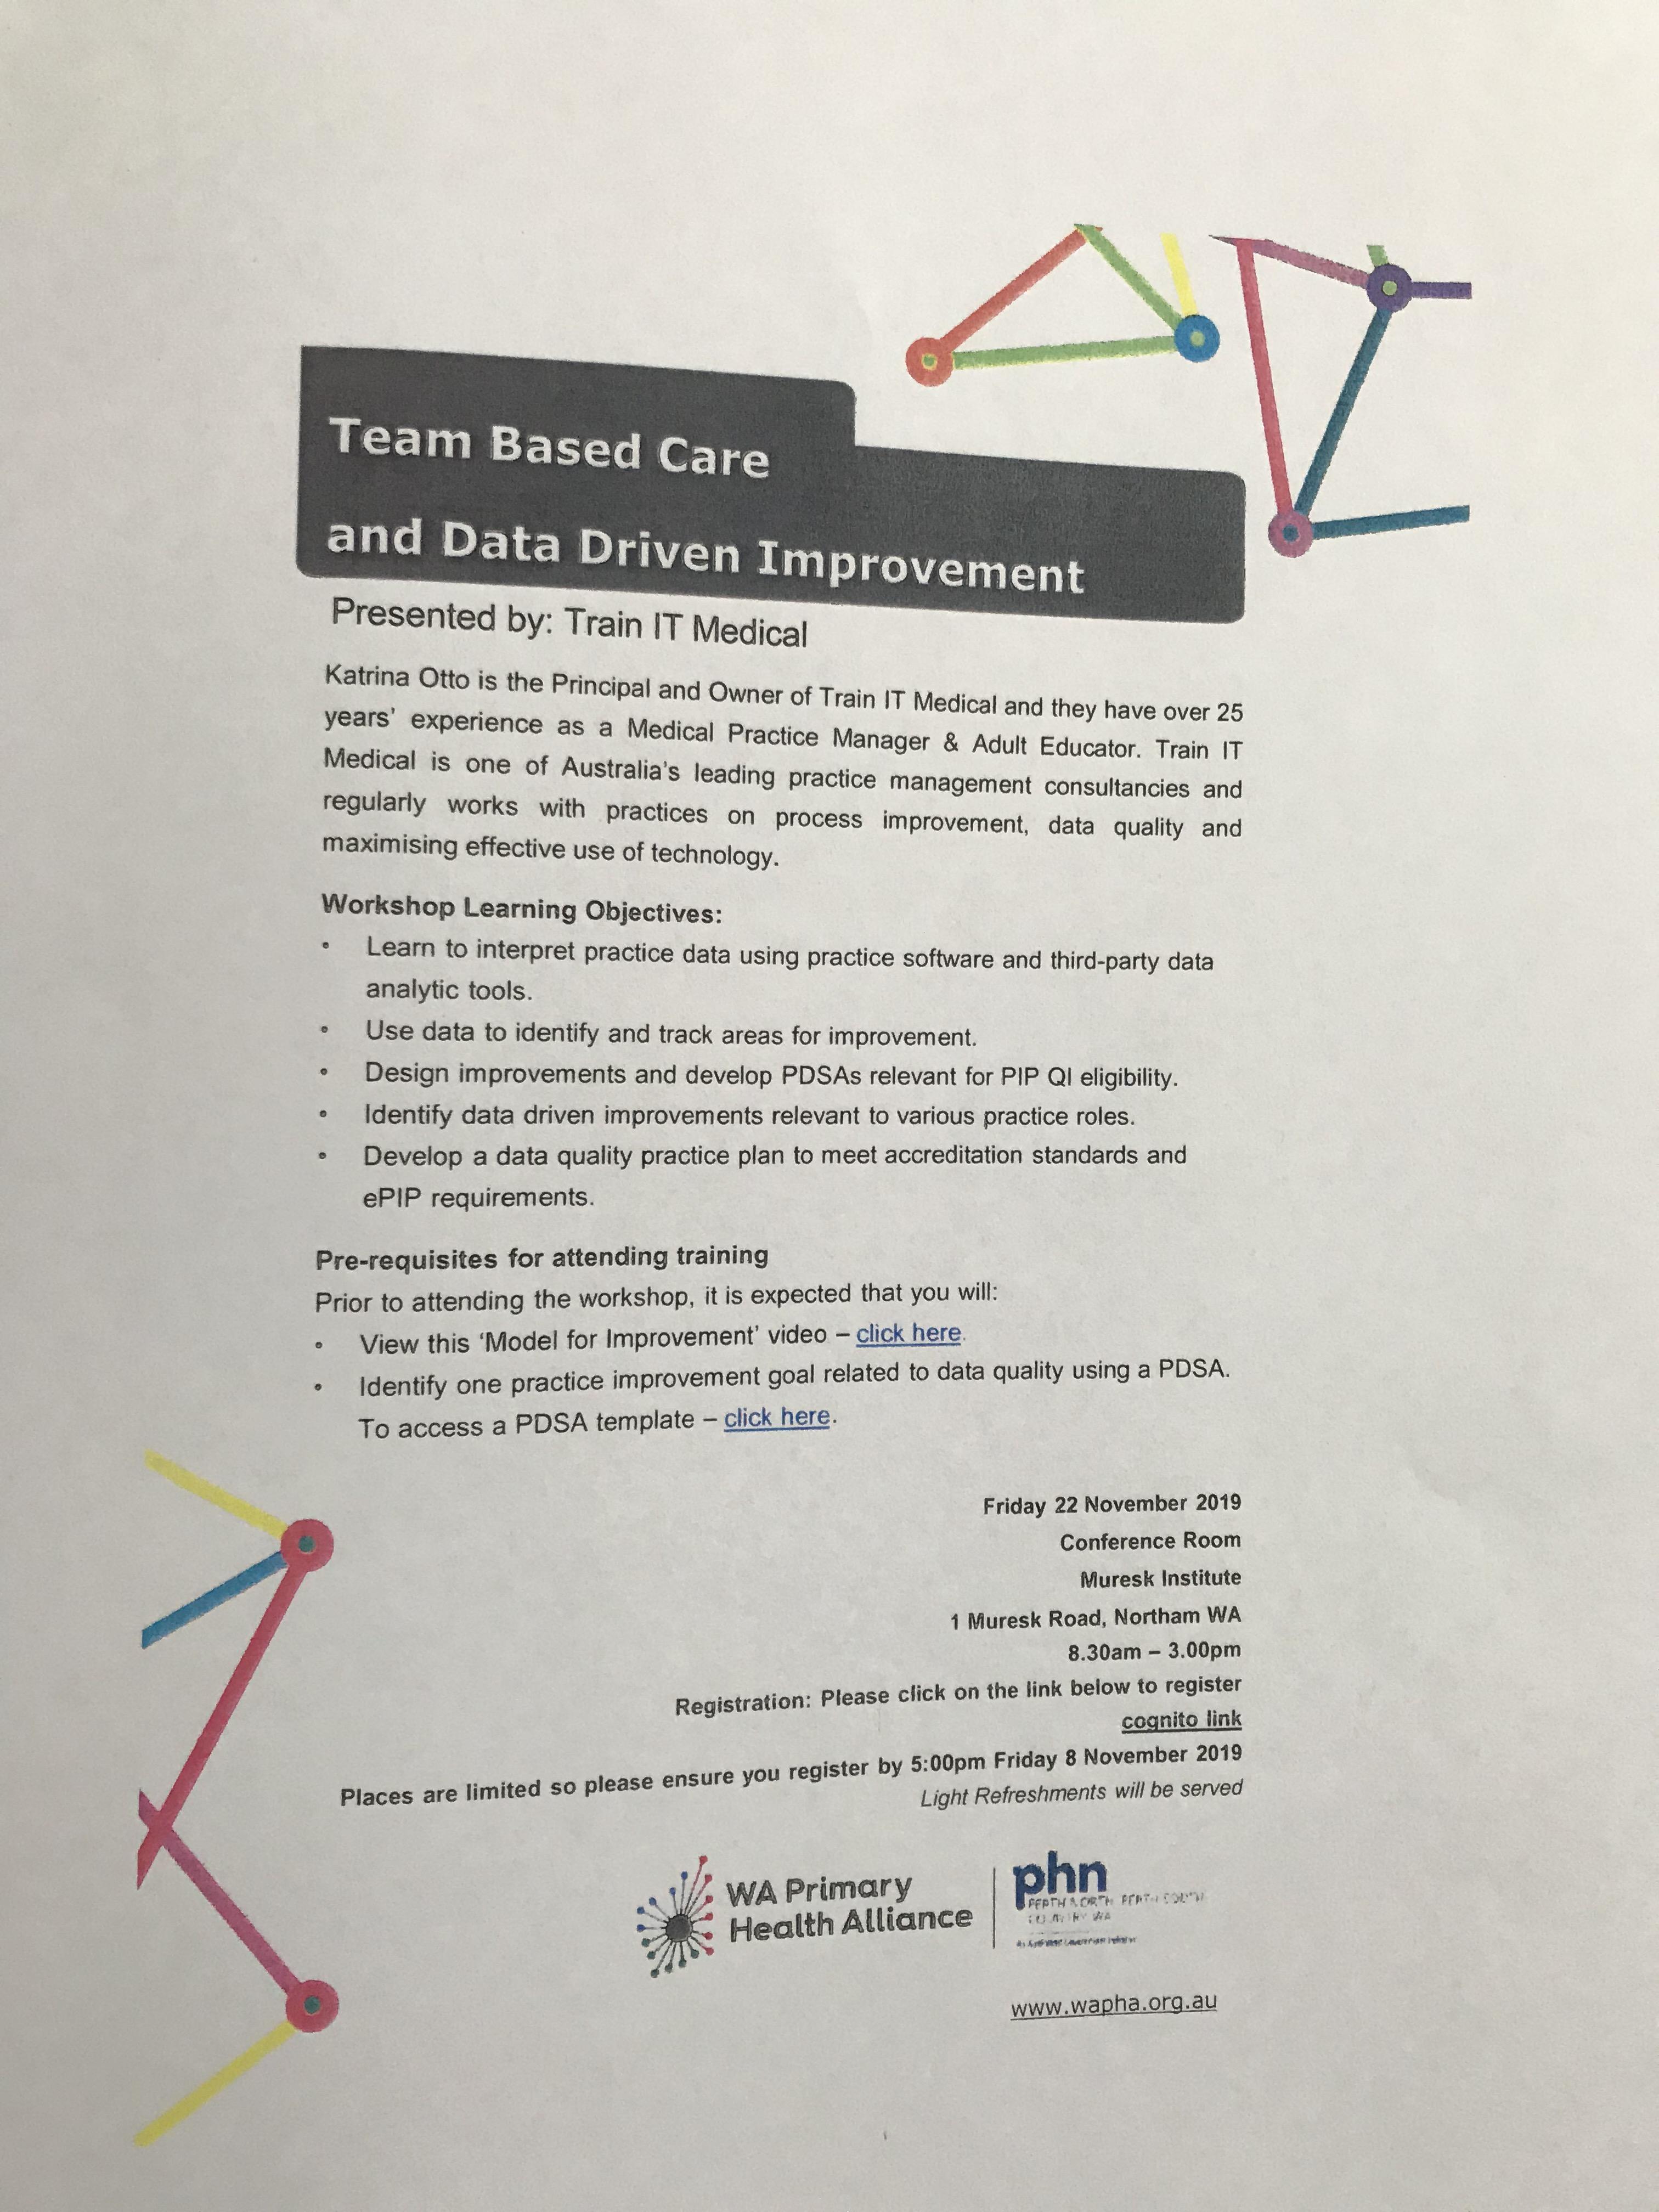 Katrina otto training team based care